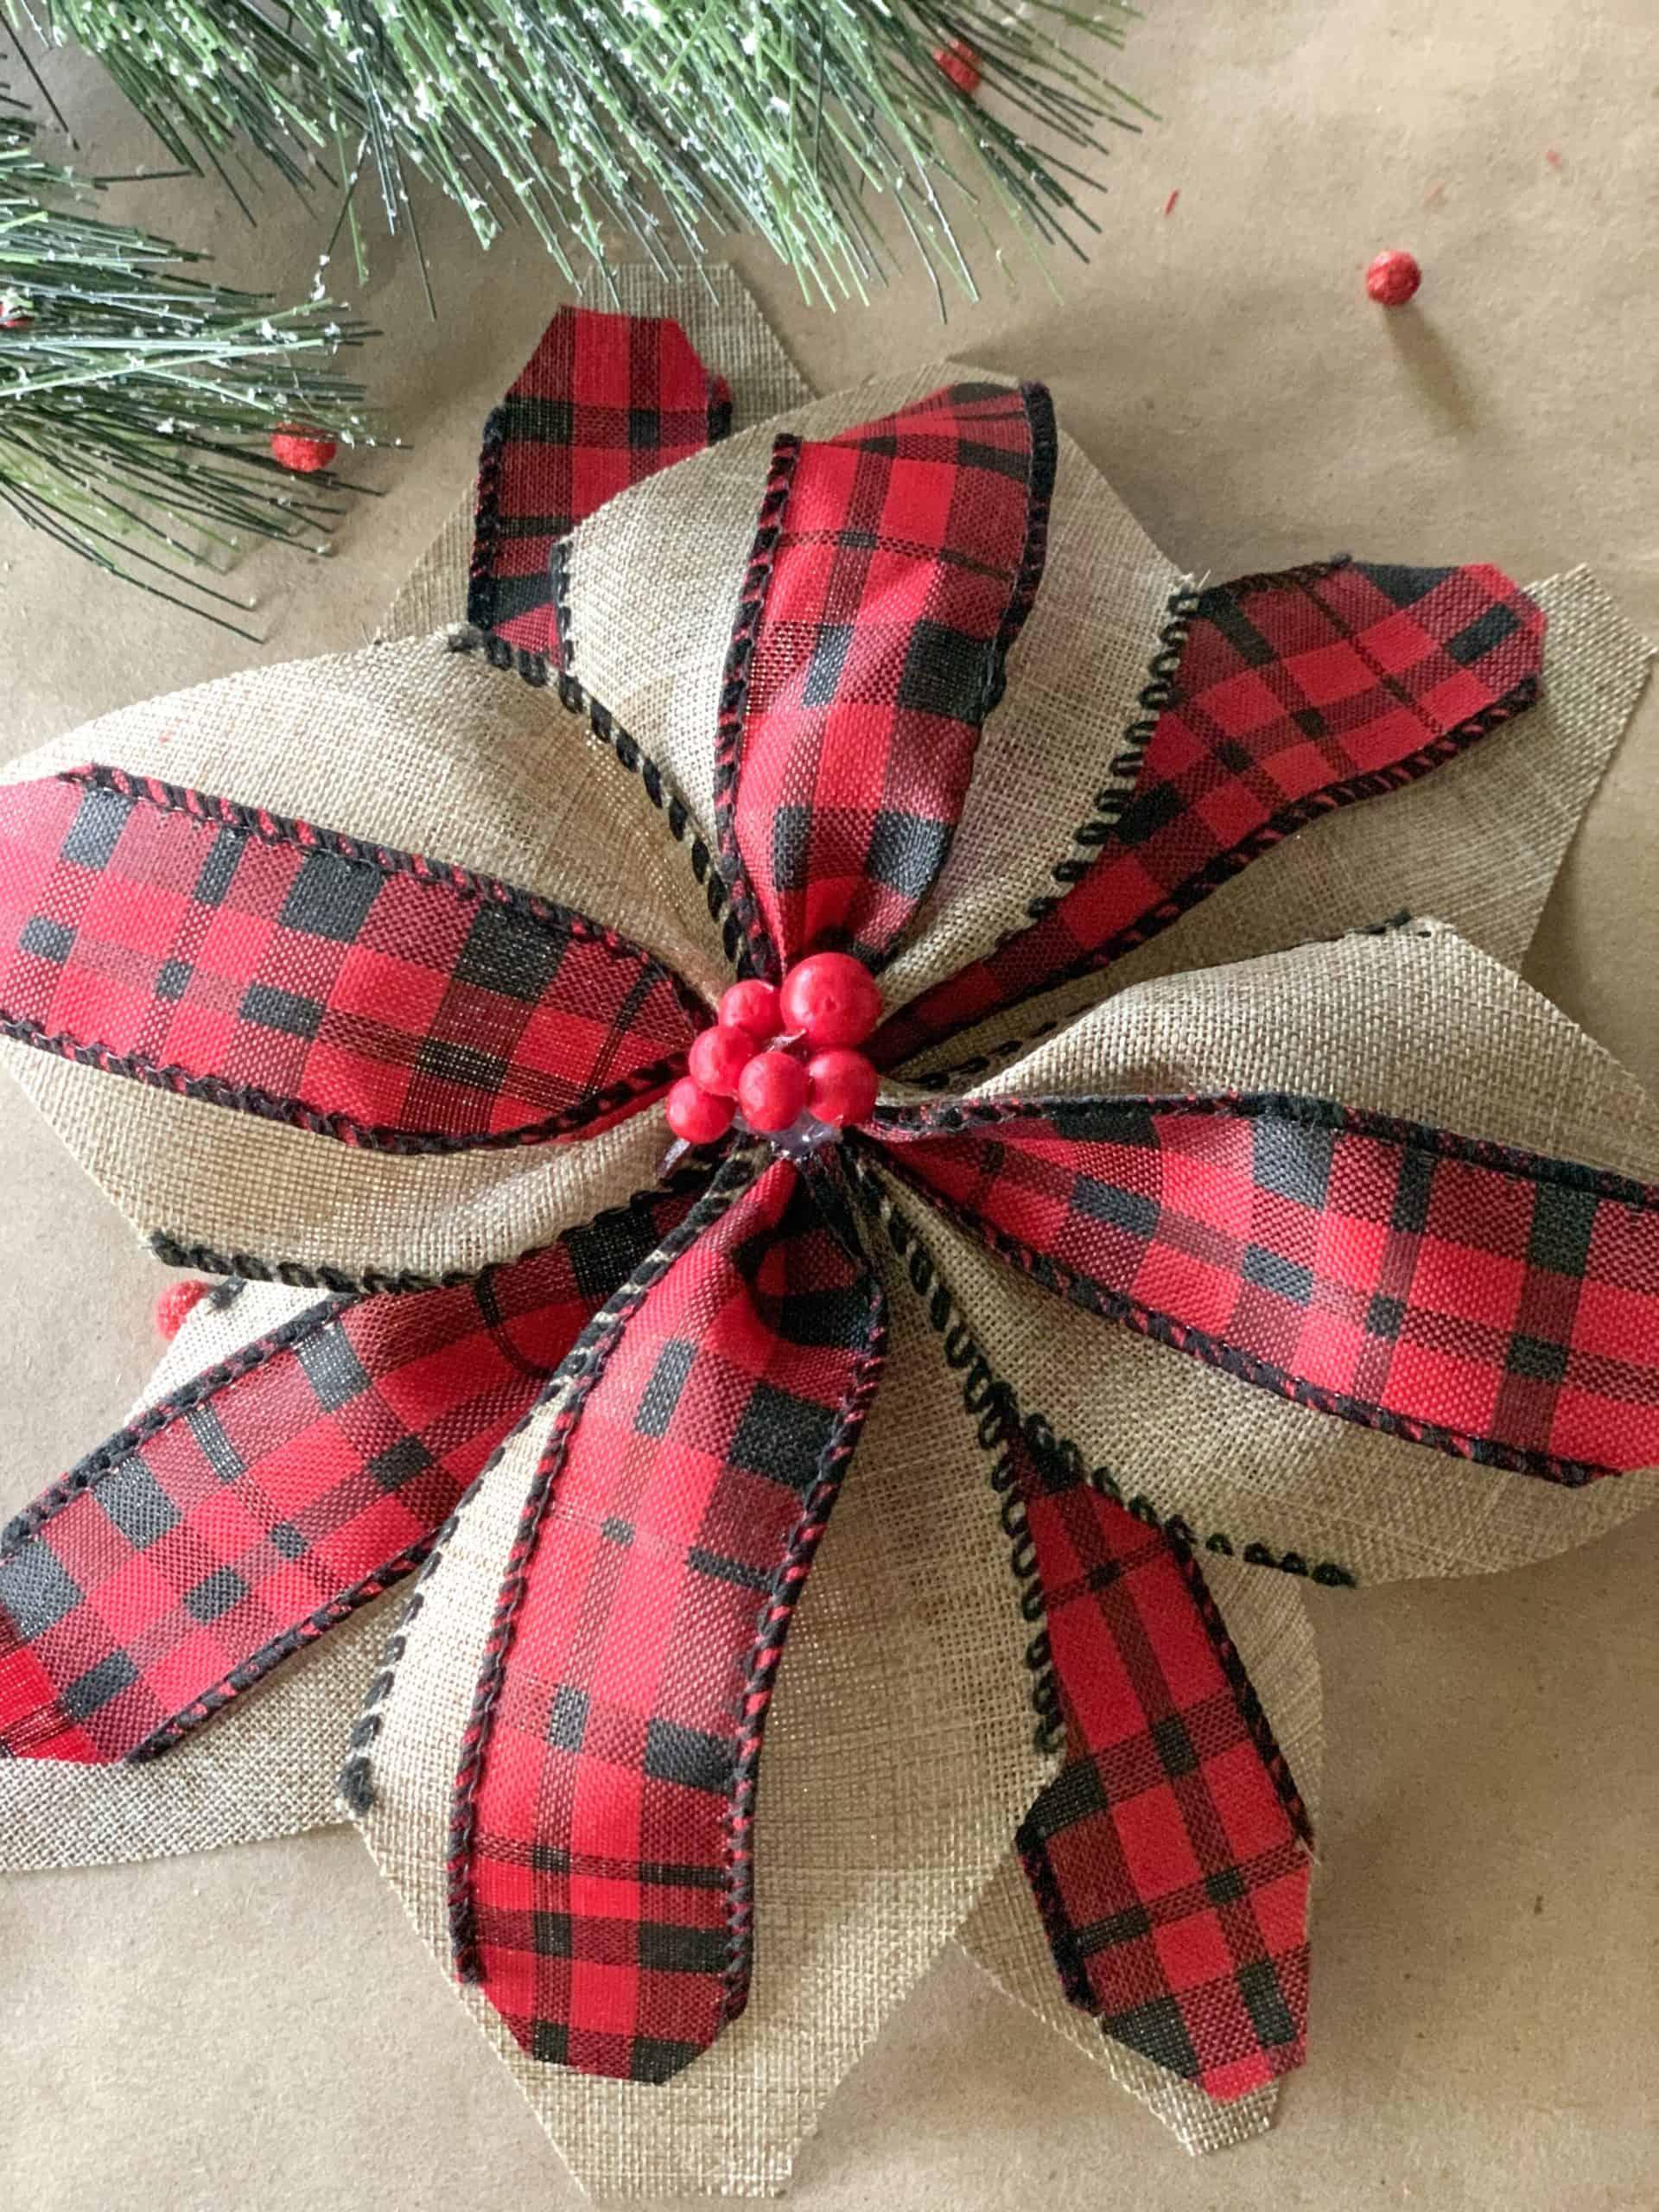 finished ribbon poinsettia.